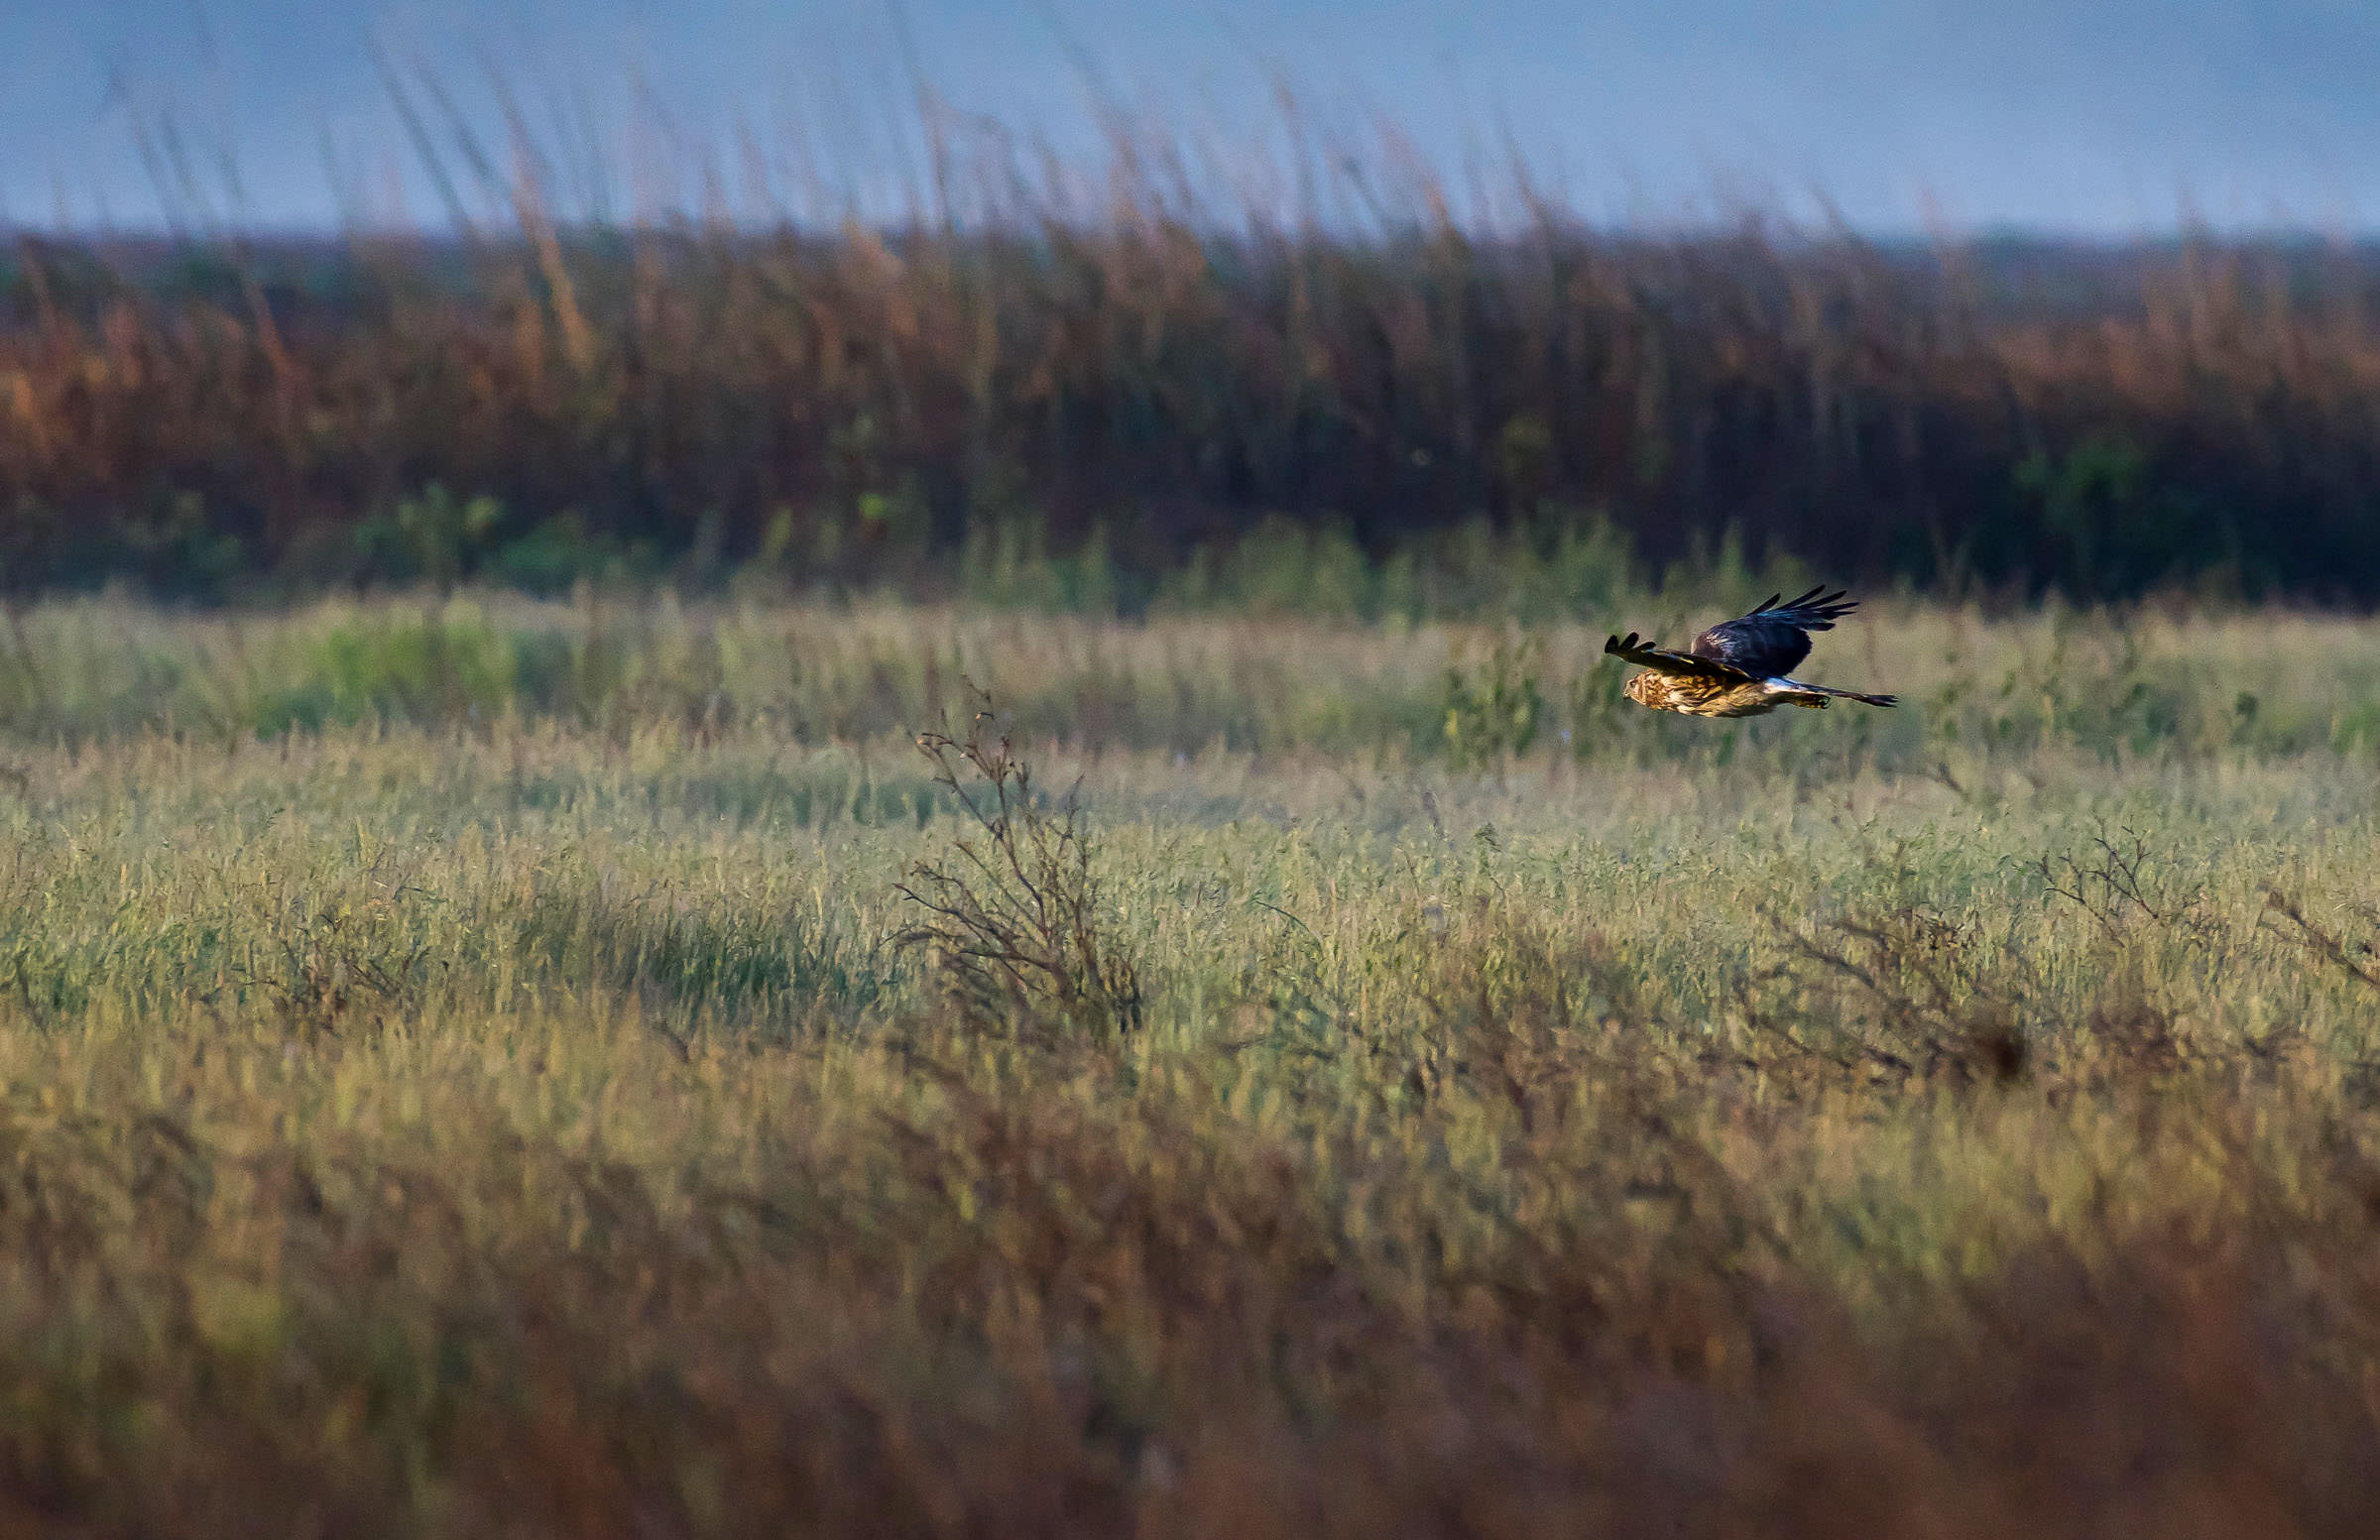 northern_harrier_hunting_jackrabbit-3.jpg